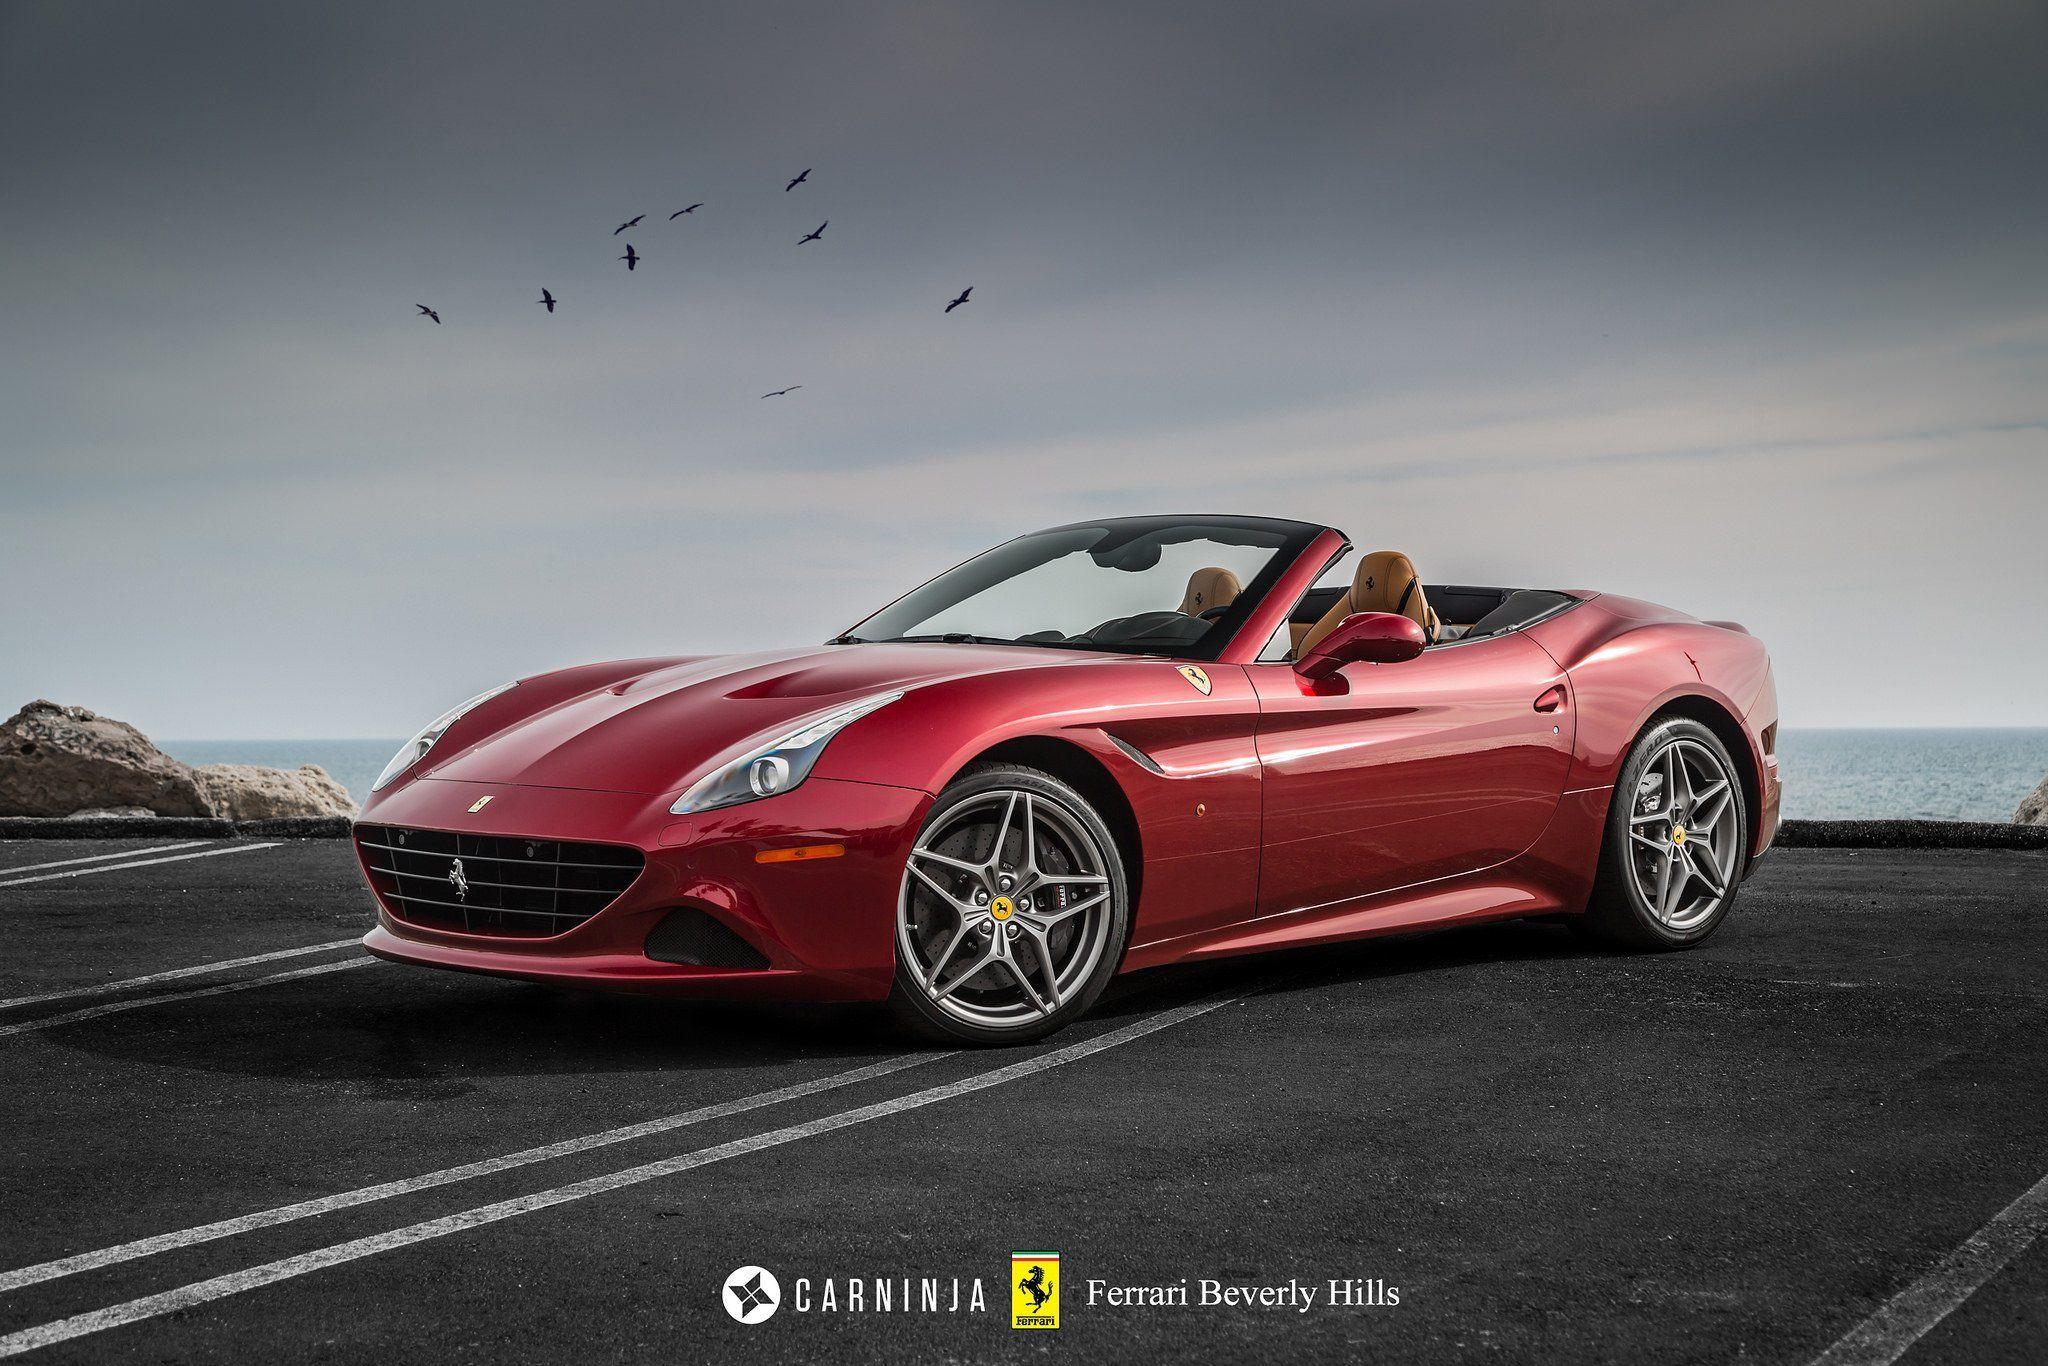 Ferrari California Wallpapers Top Free Ferrari California Backgrounds Wallpaperaccess